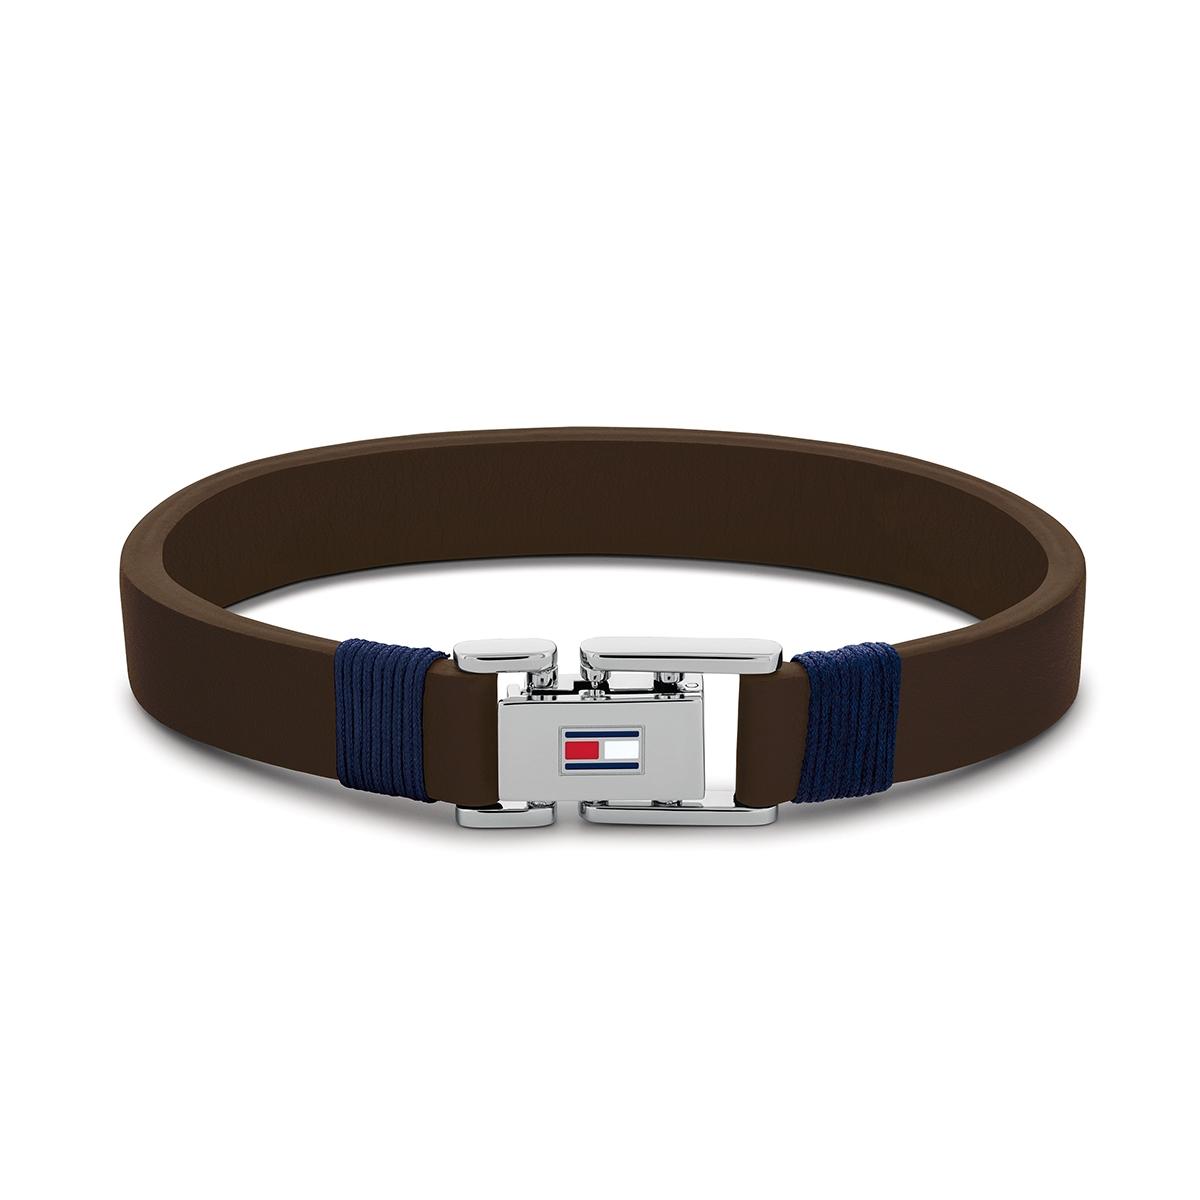 Denim bracelet TJ2790227S (Taille: 19.50 cm) - Tommy hilfiger - Modalova